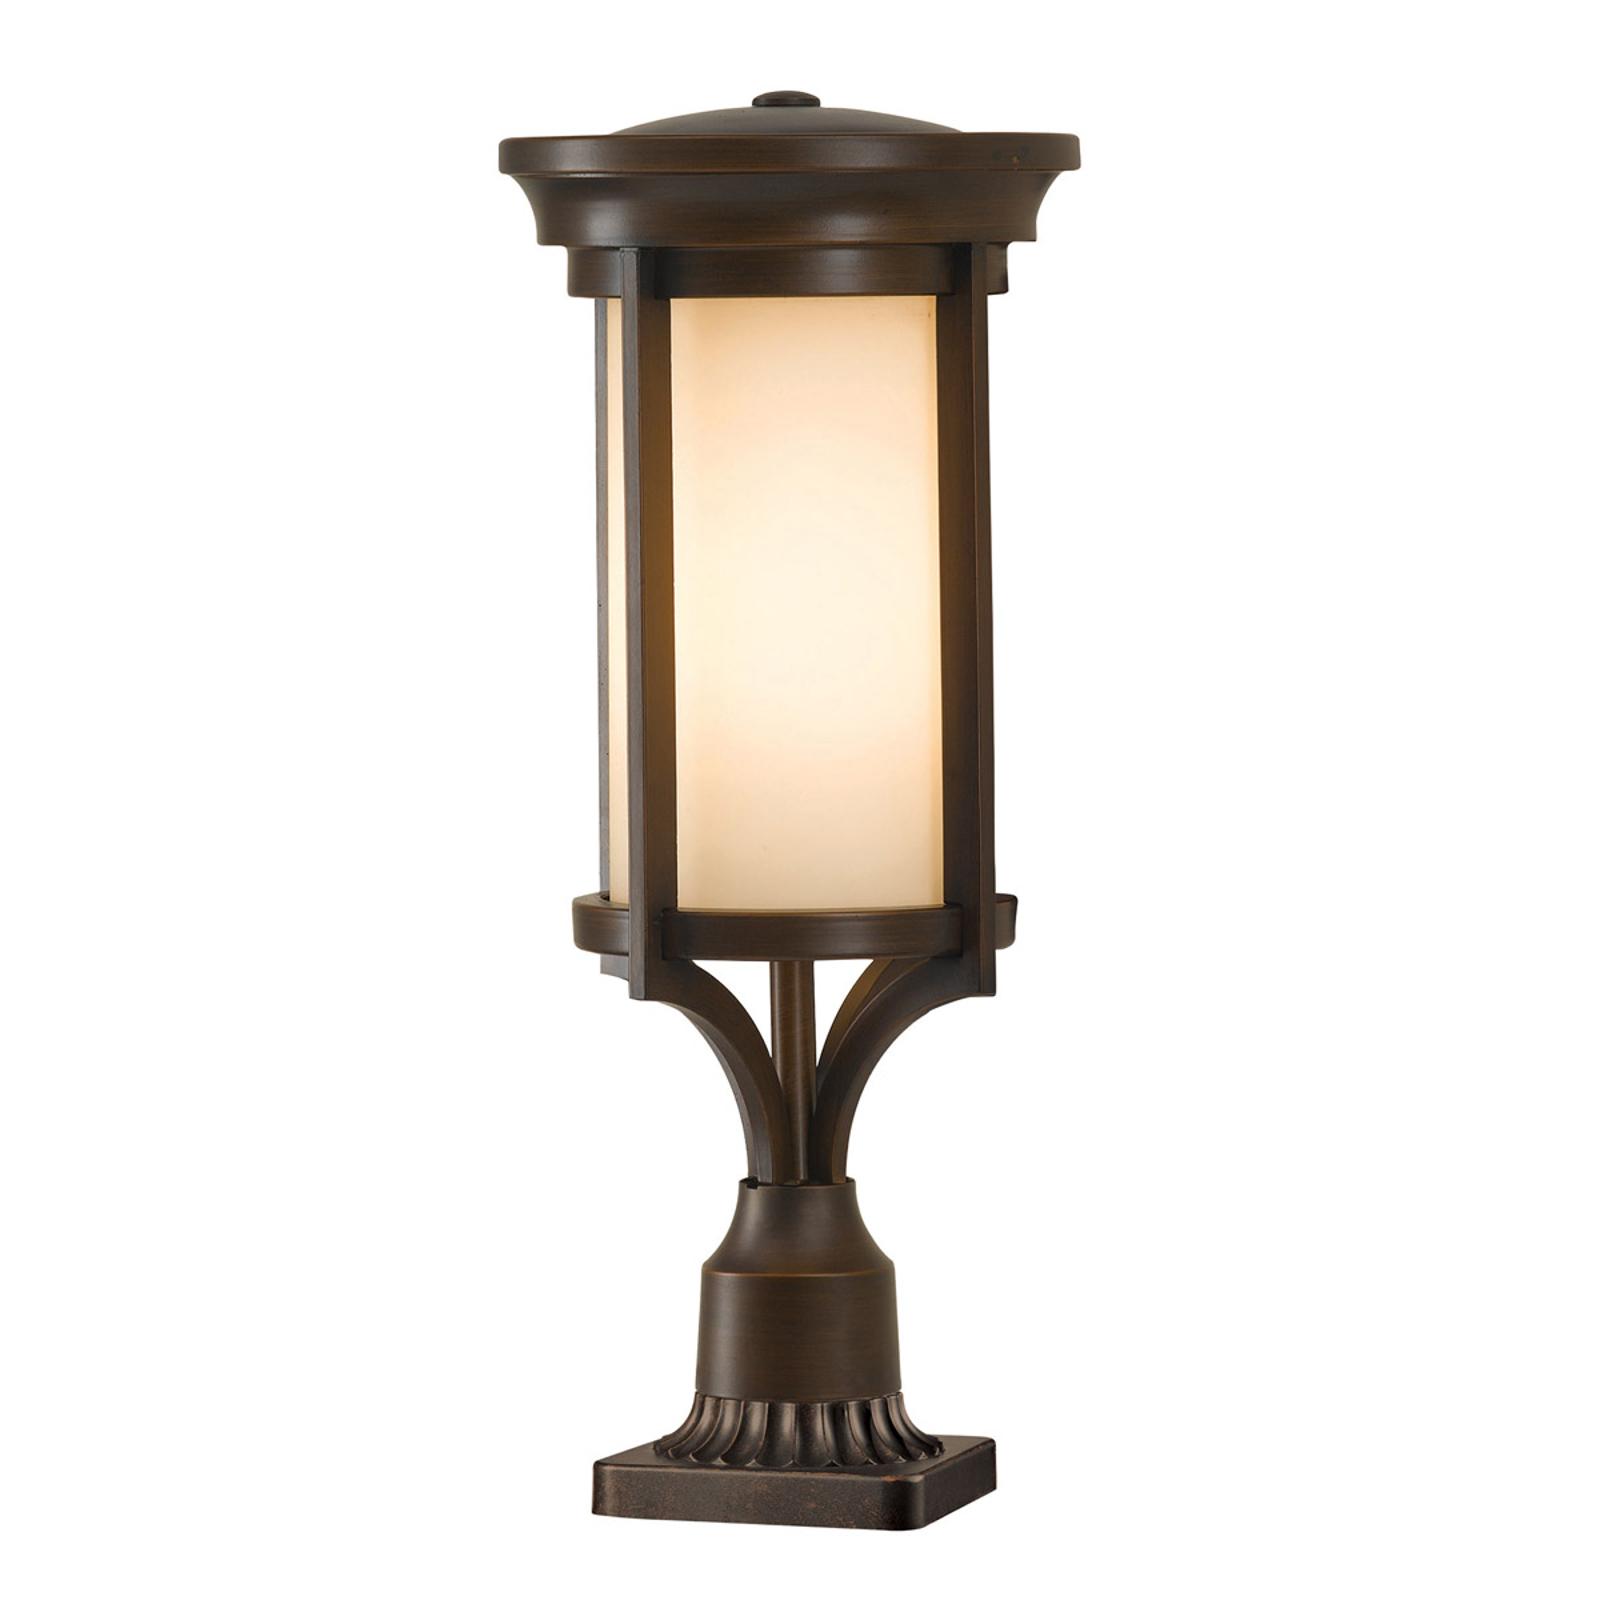 Sokkellampe Merrill